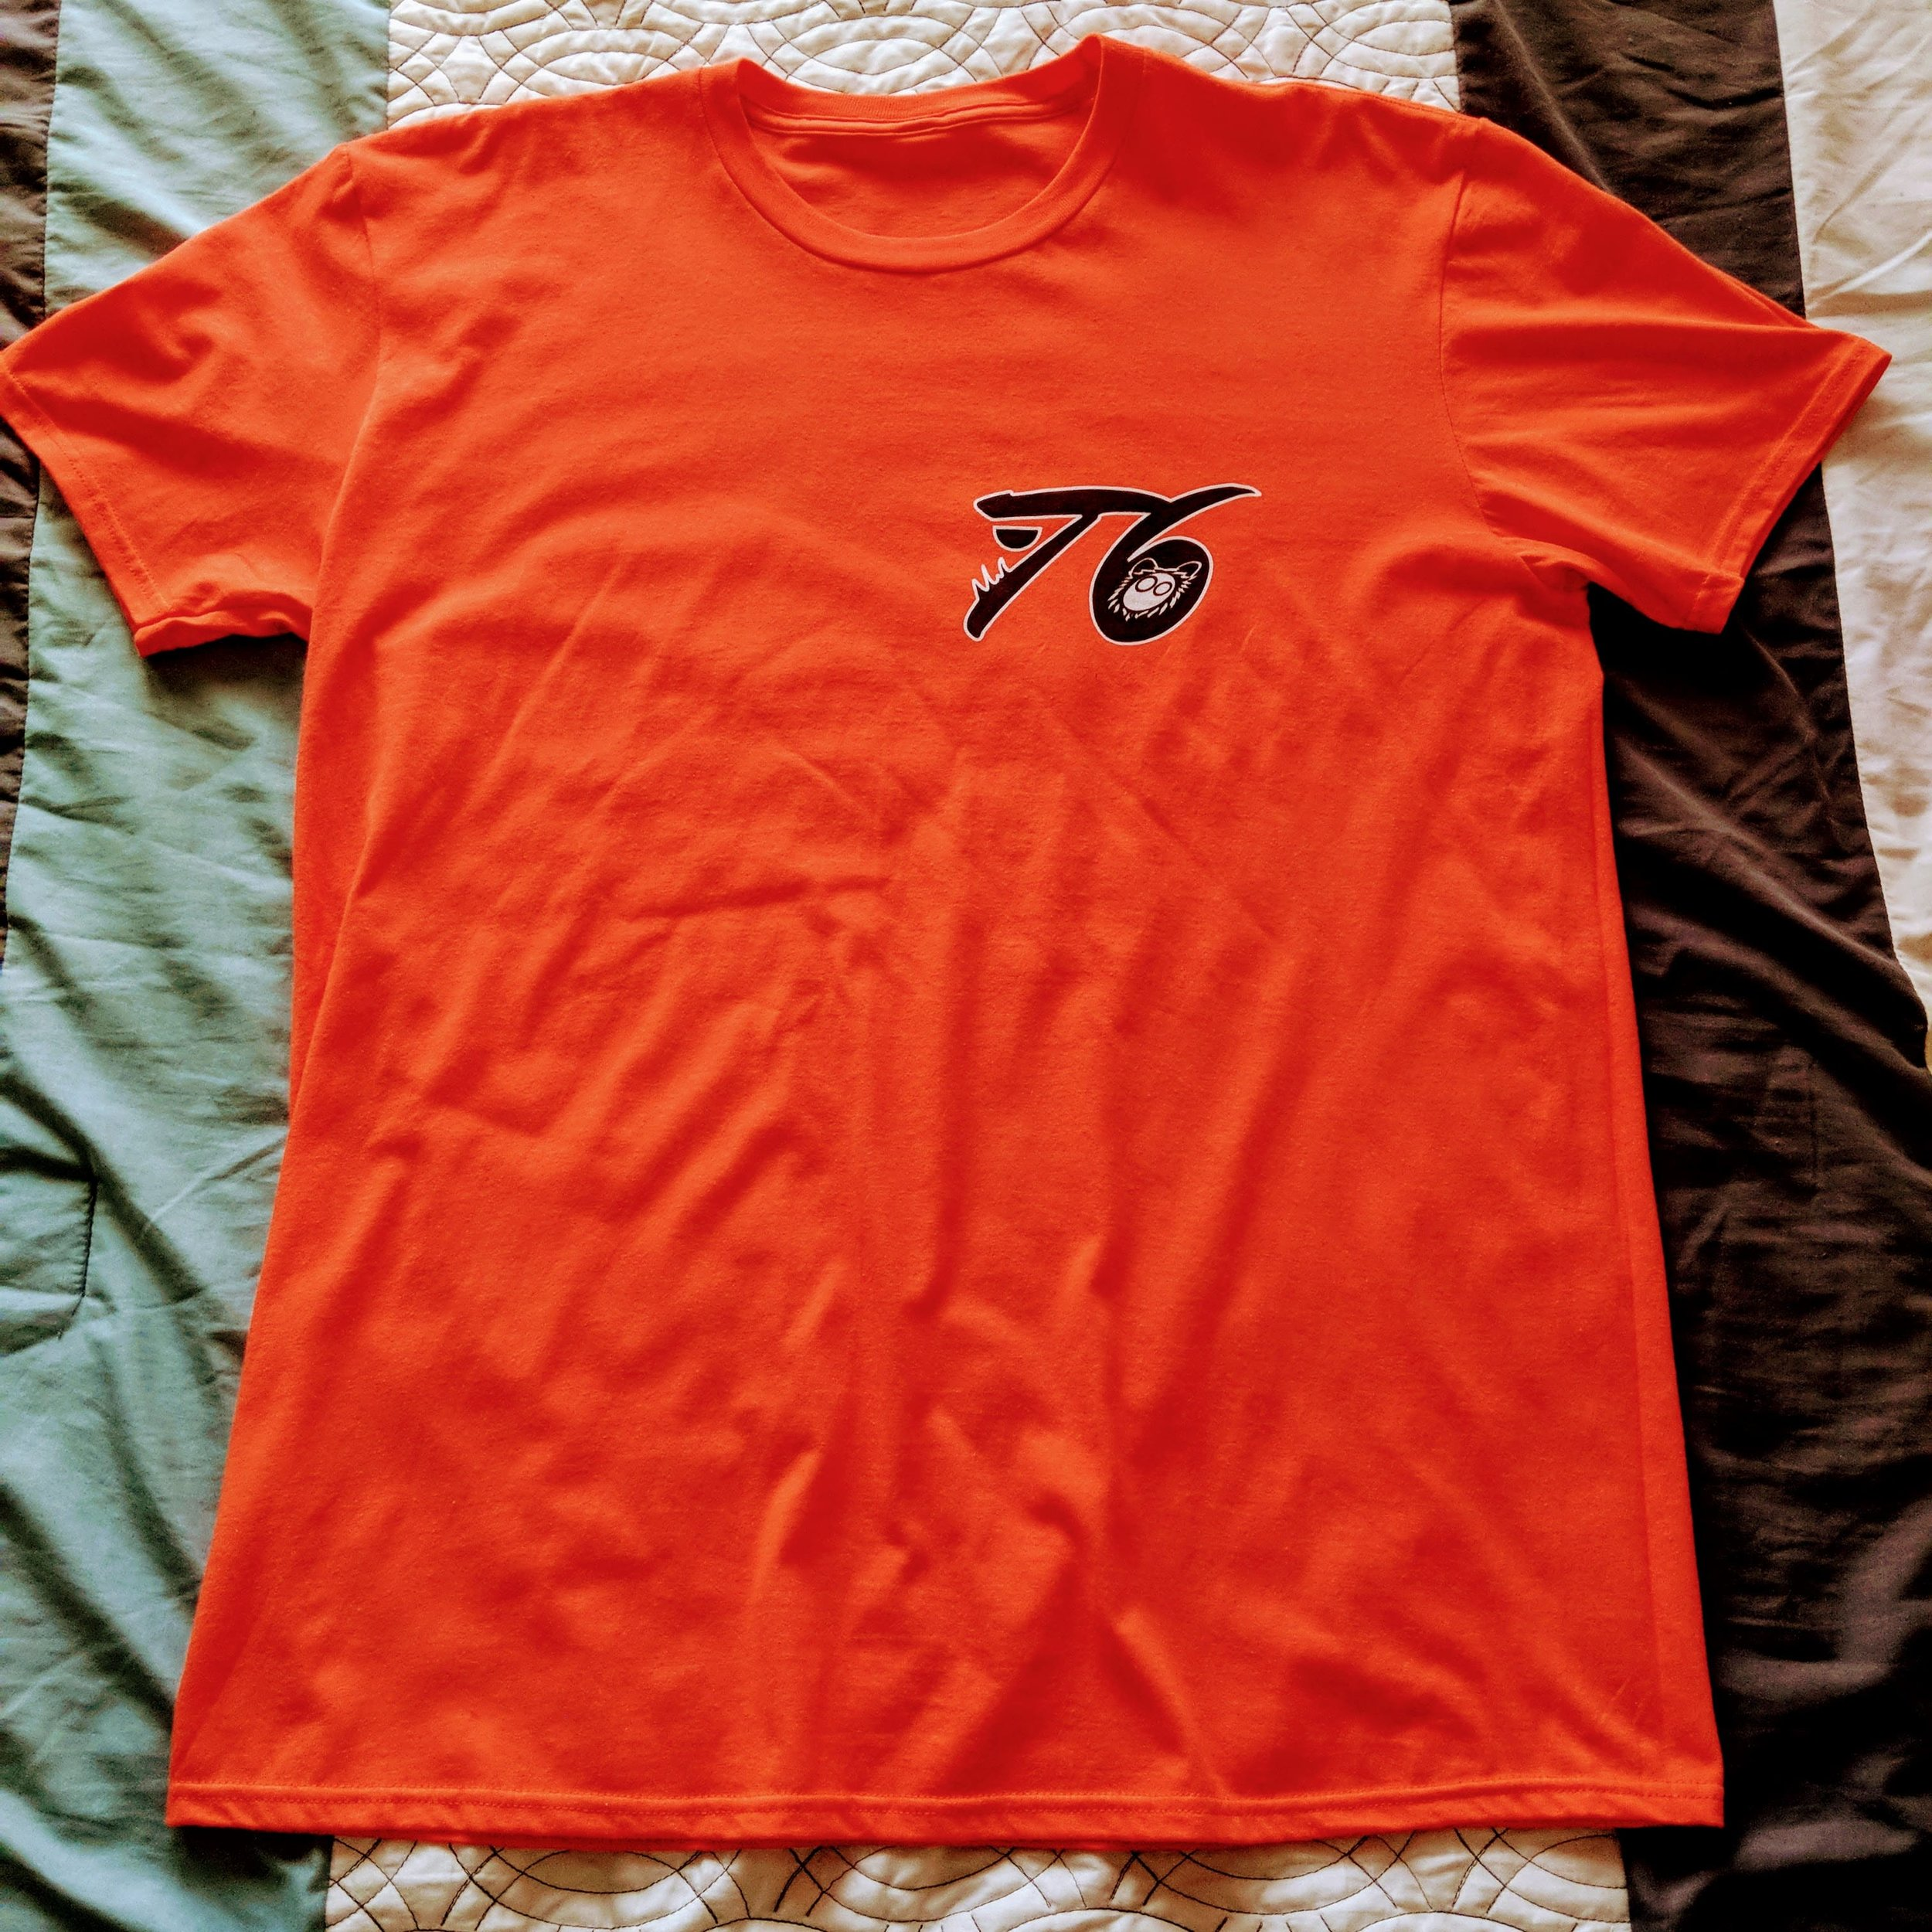 Amazon Merch: T6 Logo